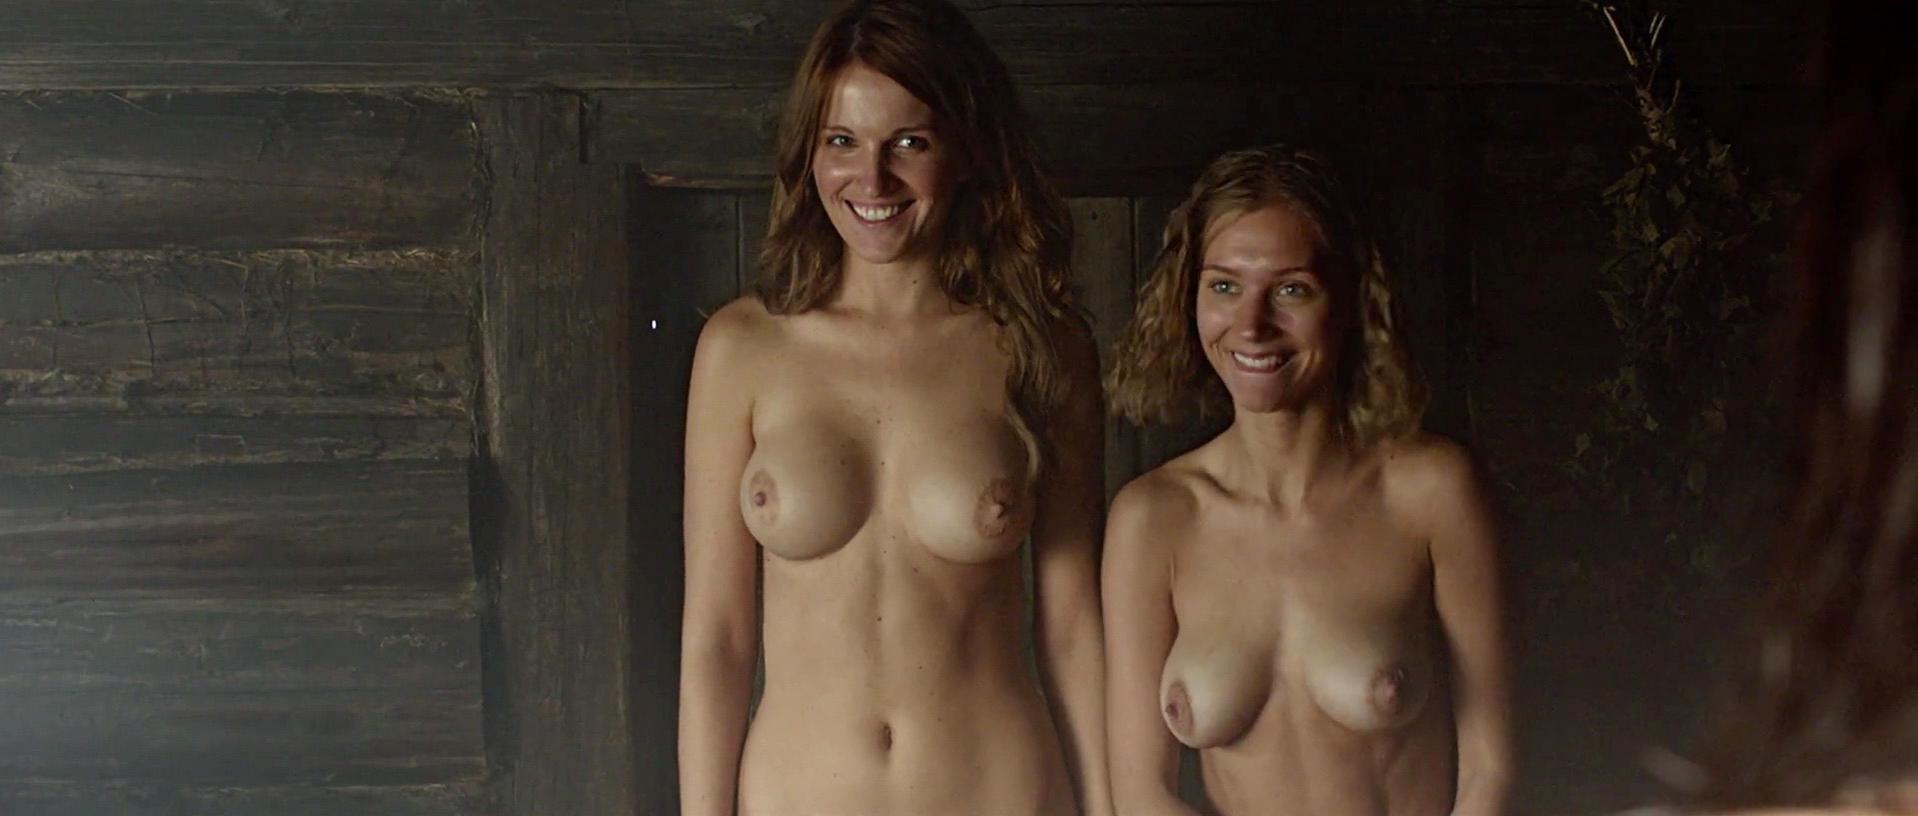 Порно асмус актрисы — pic 1